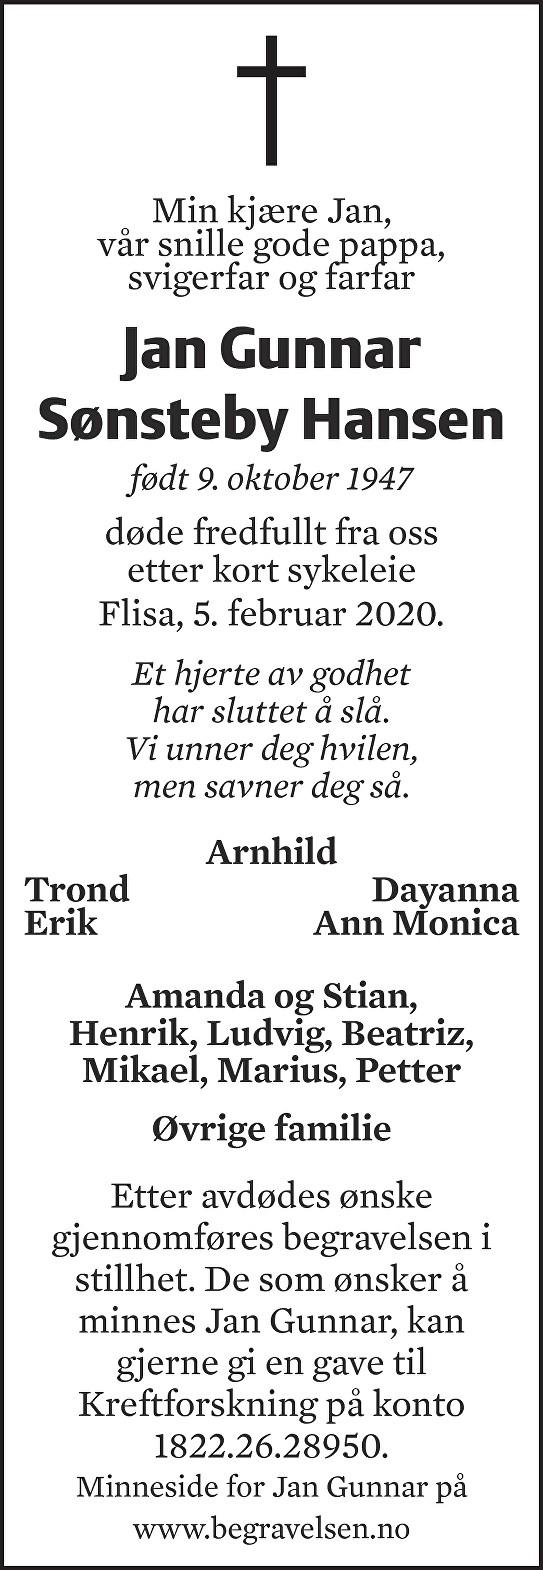 Jan Gunnar Sønsteby Hansen Dødsannonse